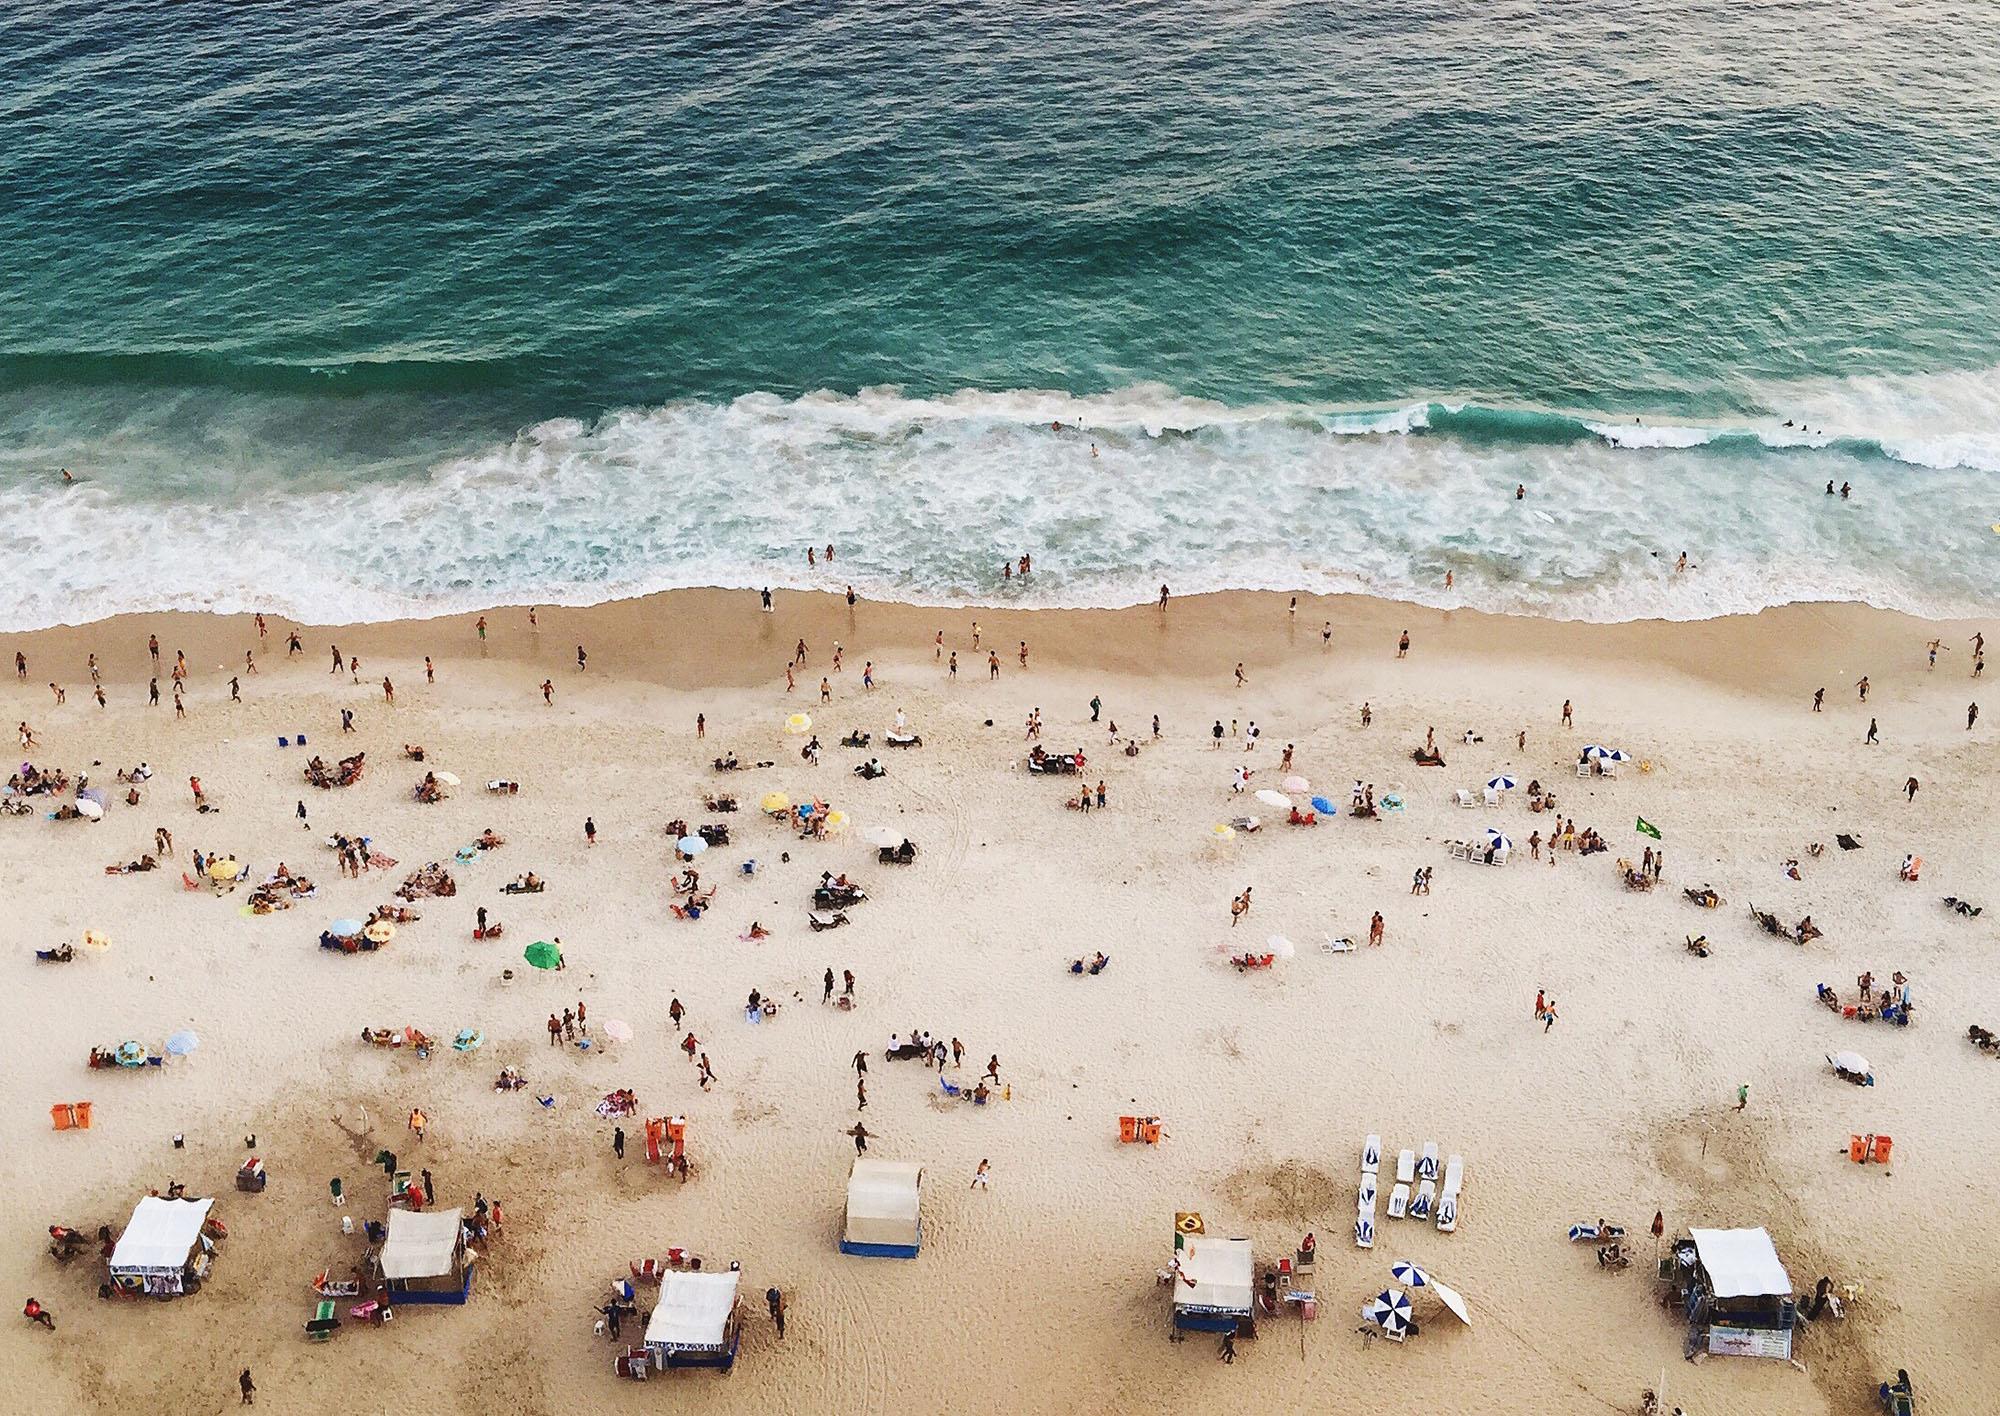 Ipanema Beach, Rio De Janeiro, Brazil. Photo by STUDIO 1208